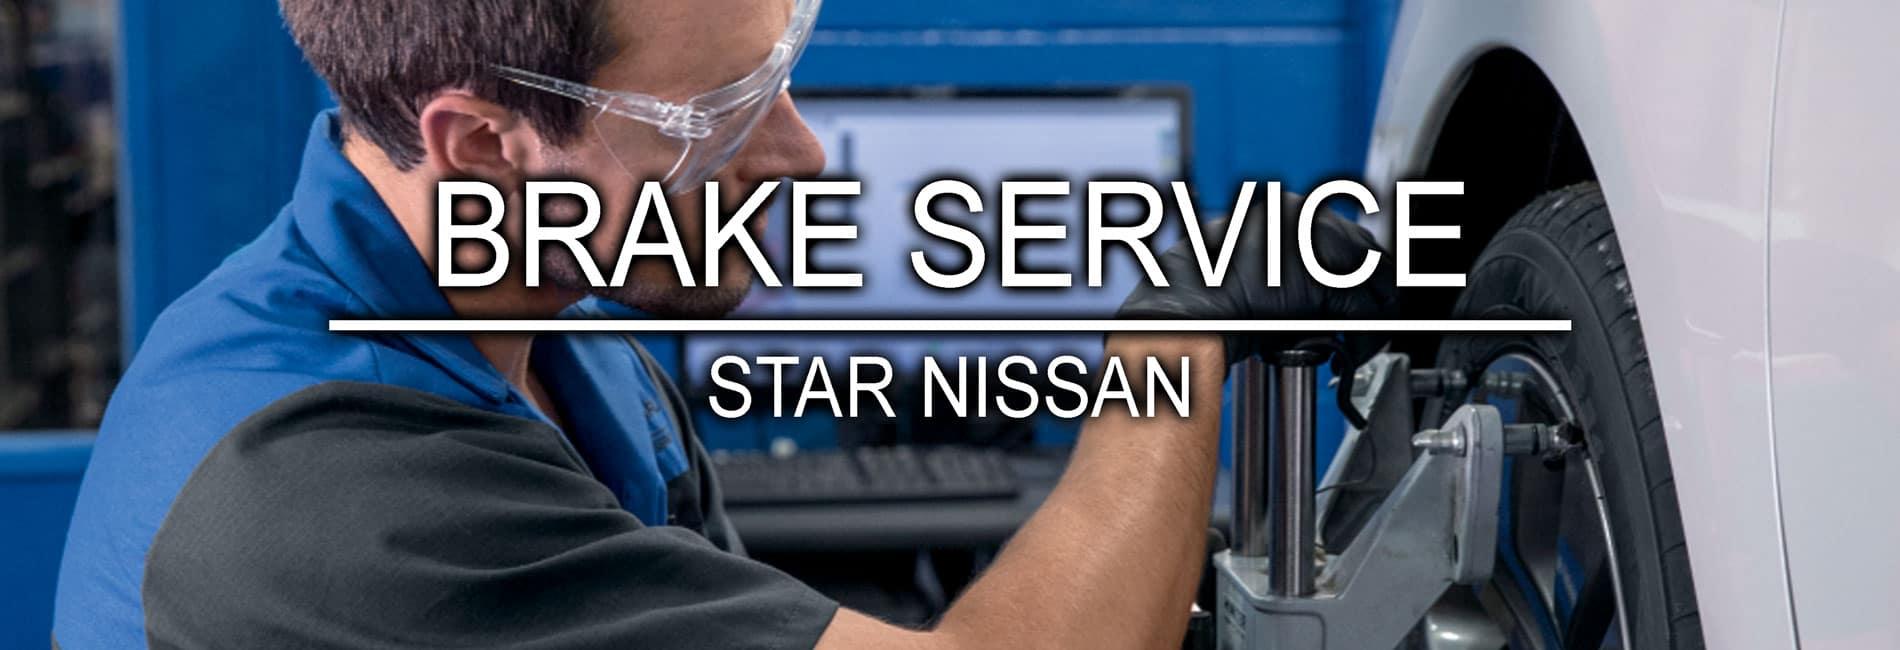 Niles Nissan Brake Service at Star Nissan